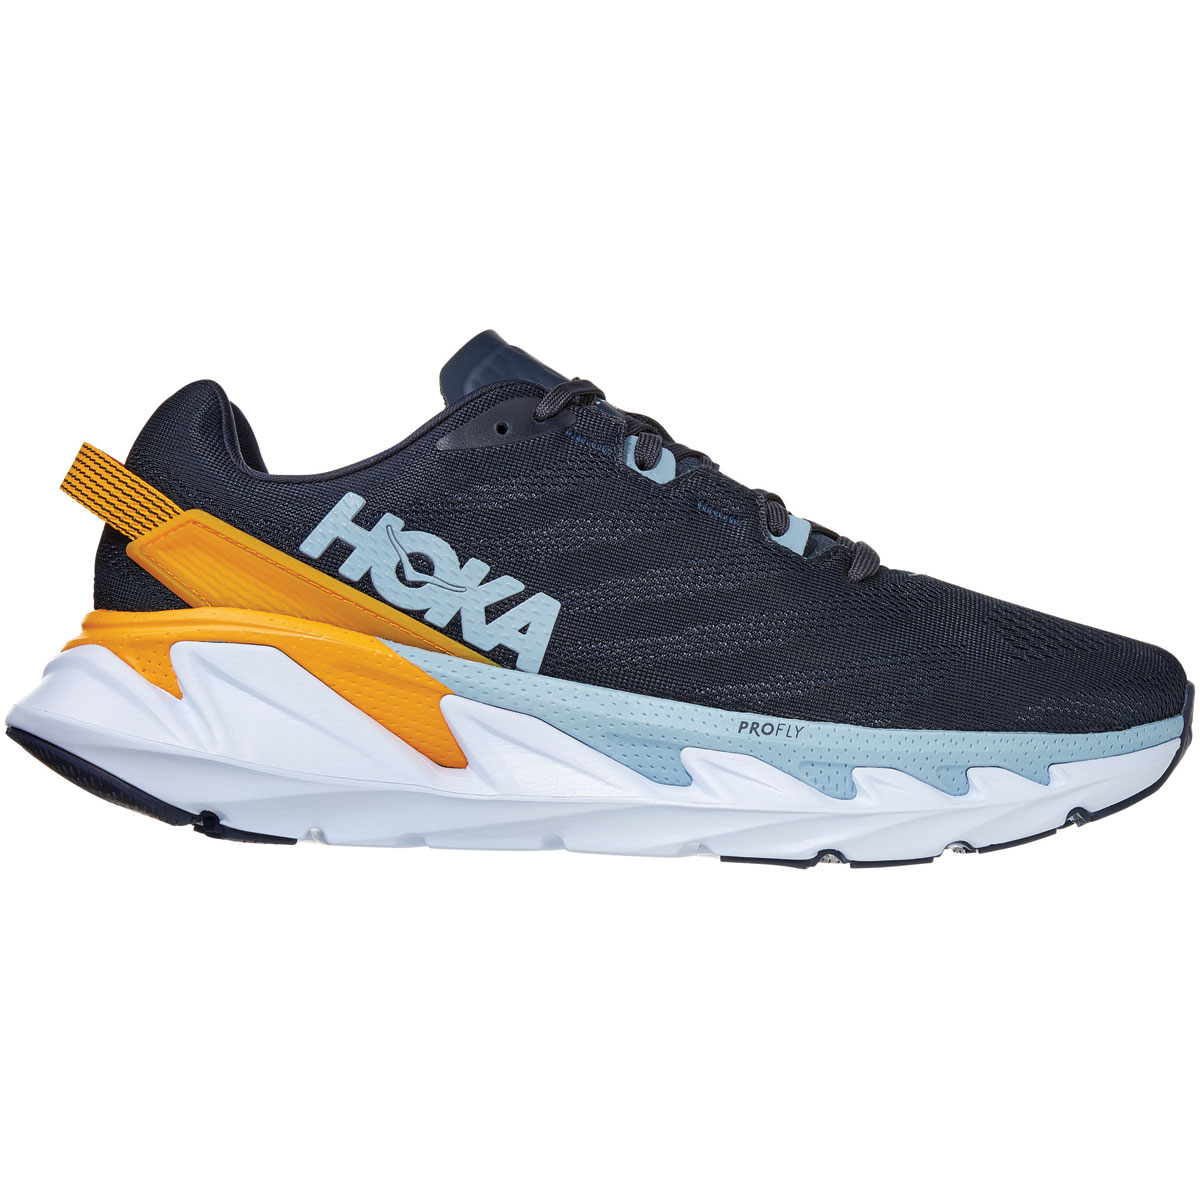 Men's Hoka One One Elevon 2 Running Shoe - Color: Ombre Blue - Size: 7 - Width: Regular, Ombre Blue, large, image 1